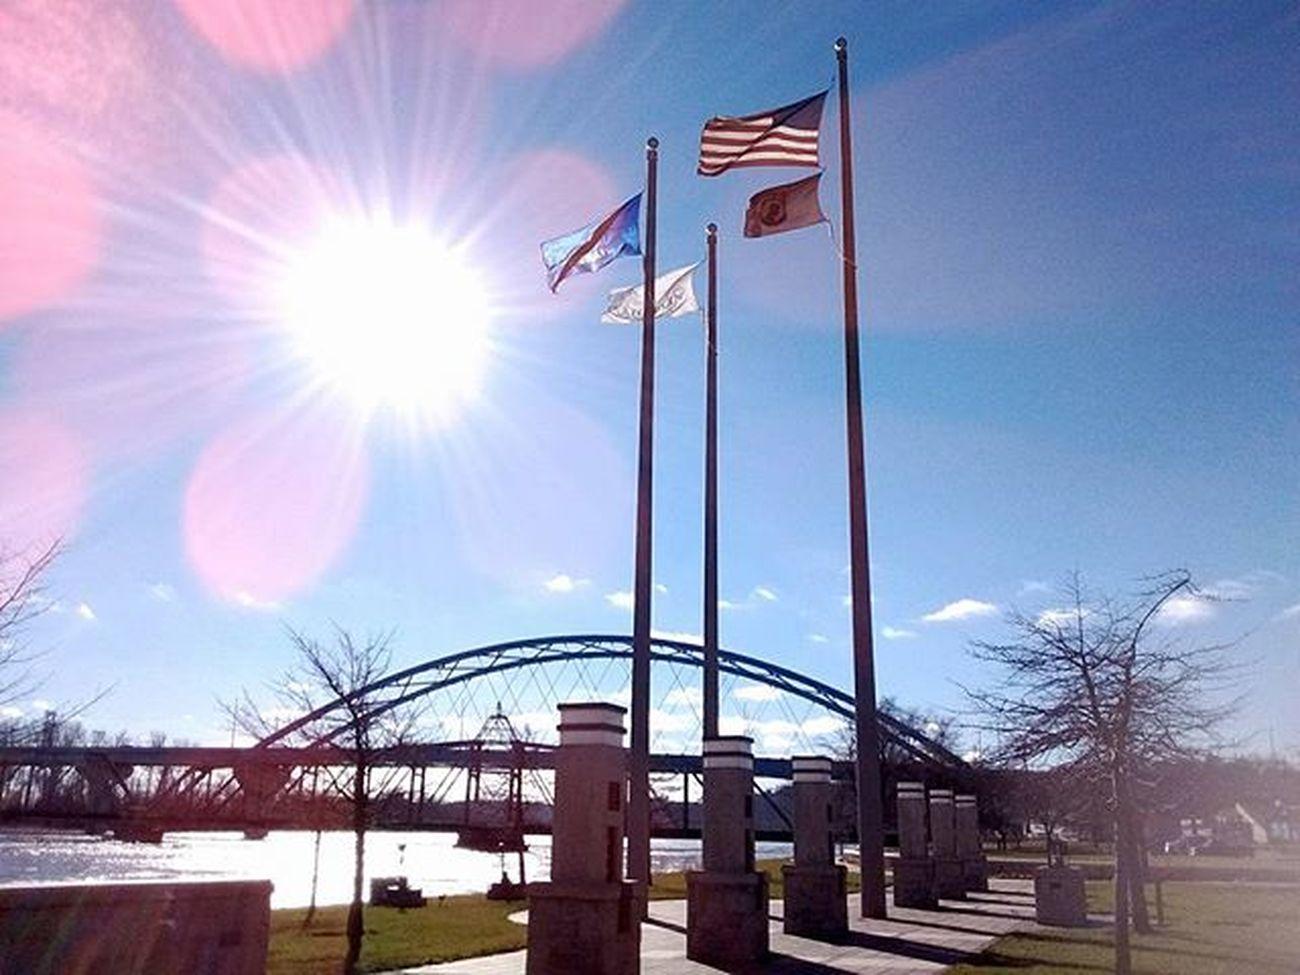 down by the river today...... Ks_pride Atchison Kansas Water Americaflag Kansasflag VeteransMemorialPark Rember Kansasphotos Kansasphotographer Sunshine Instapic Instamood Wow_america Fuckyeah